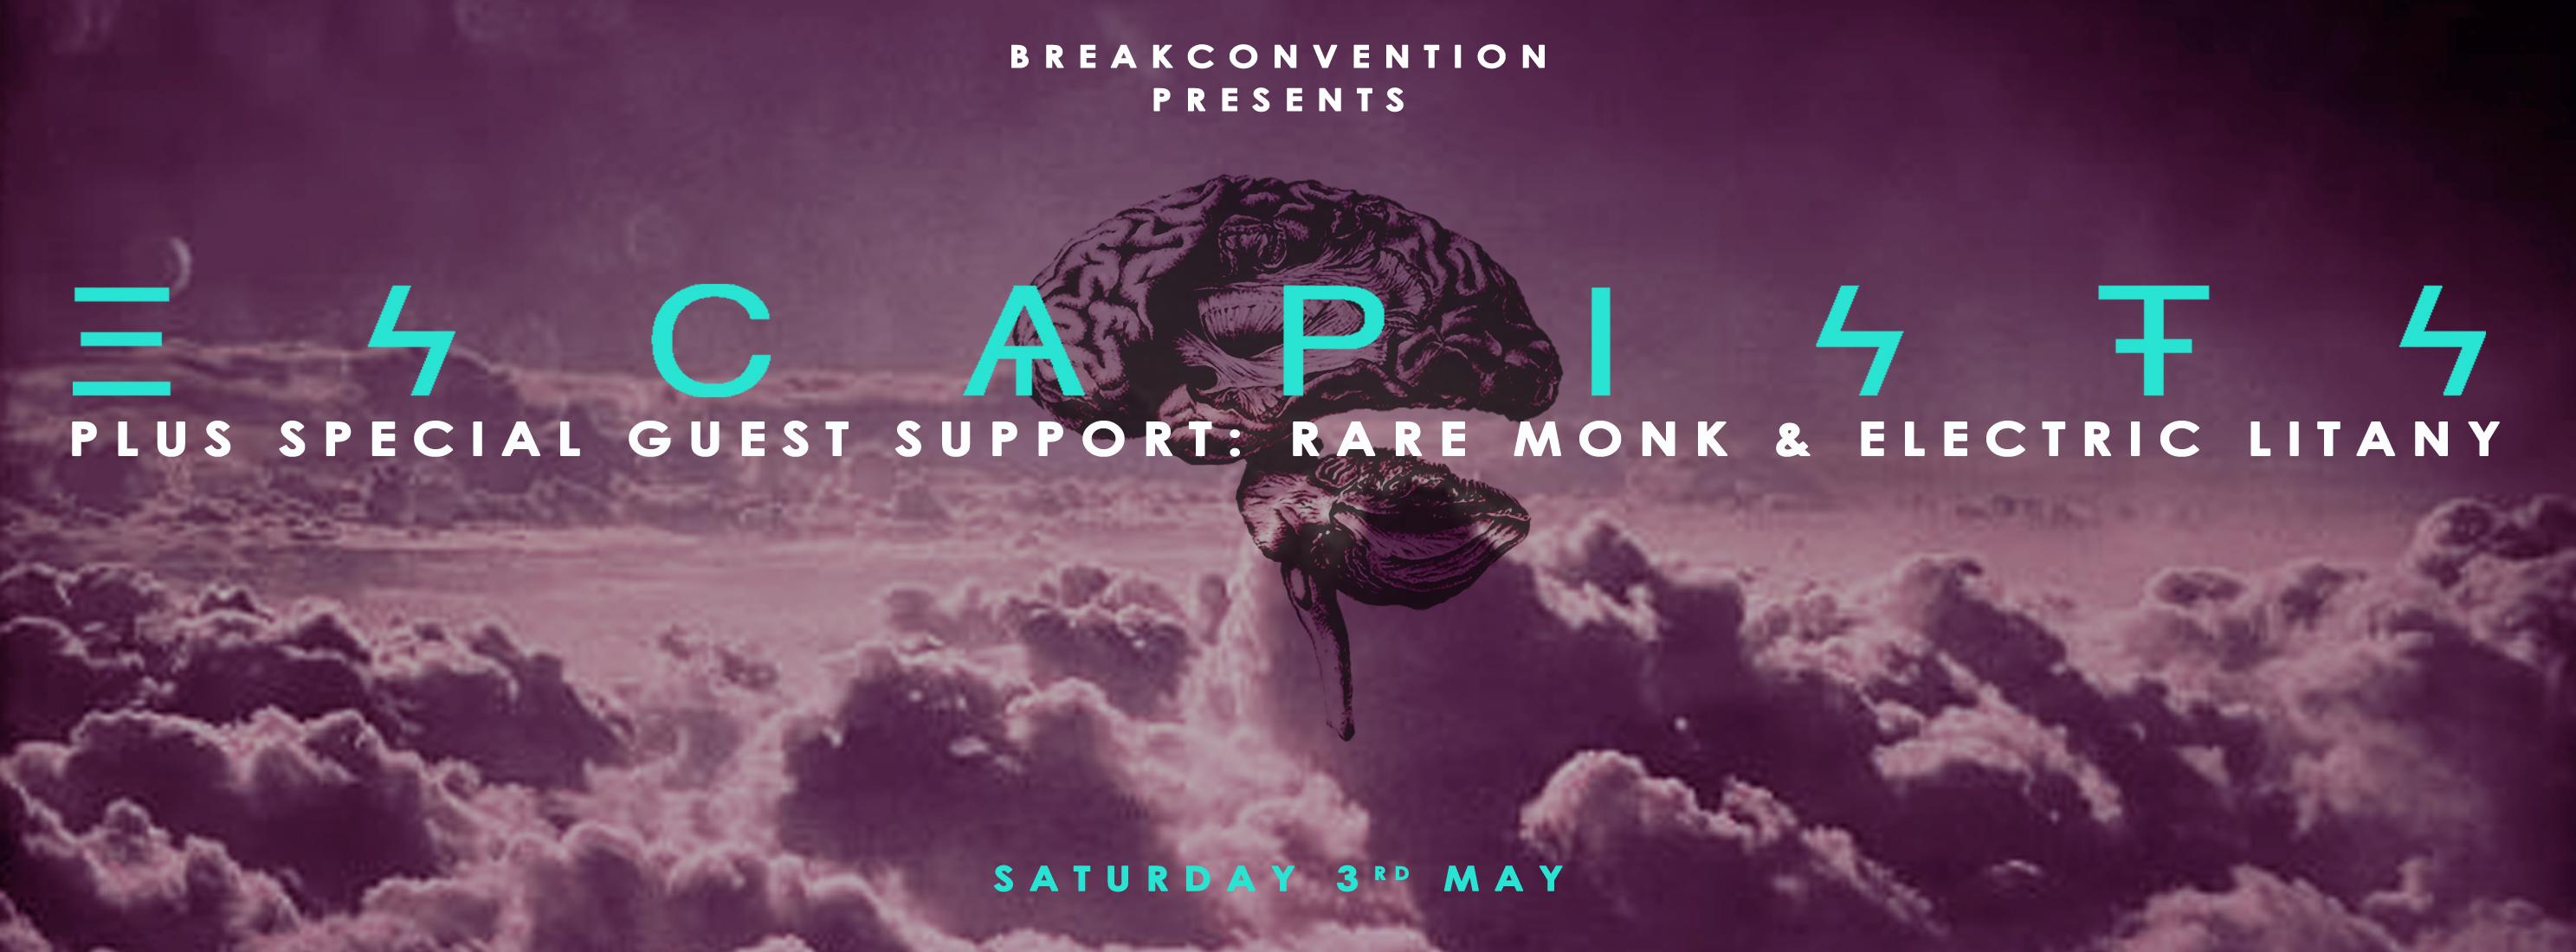 Breakconvention Live